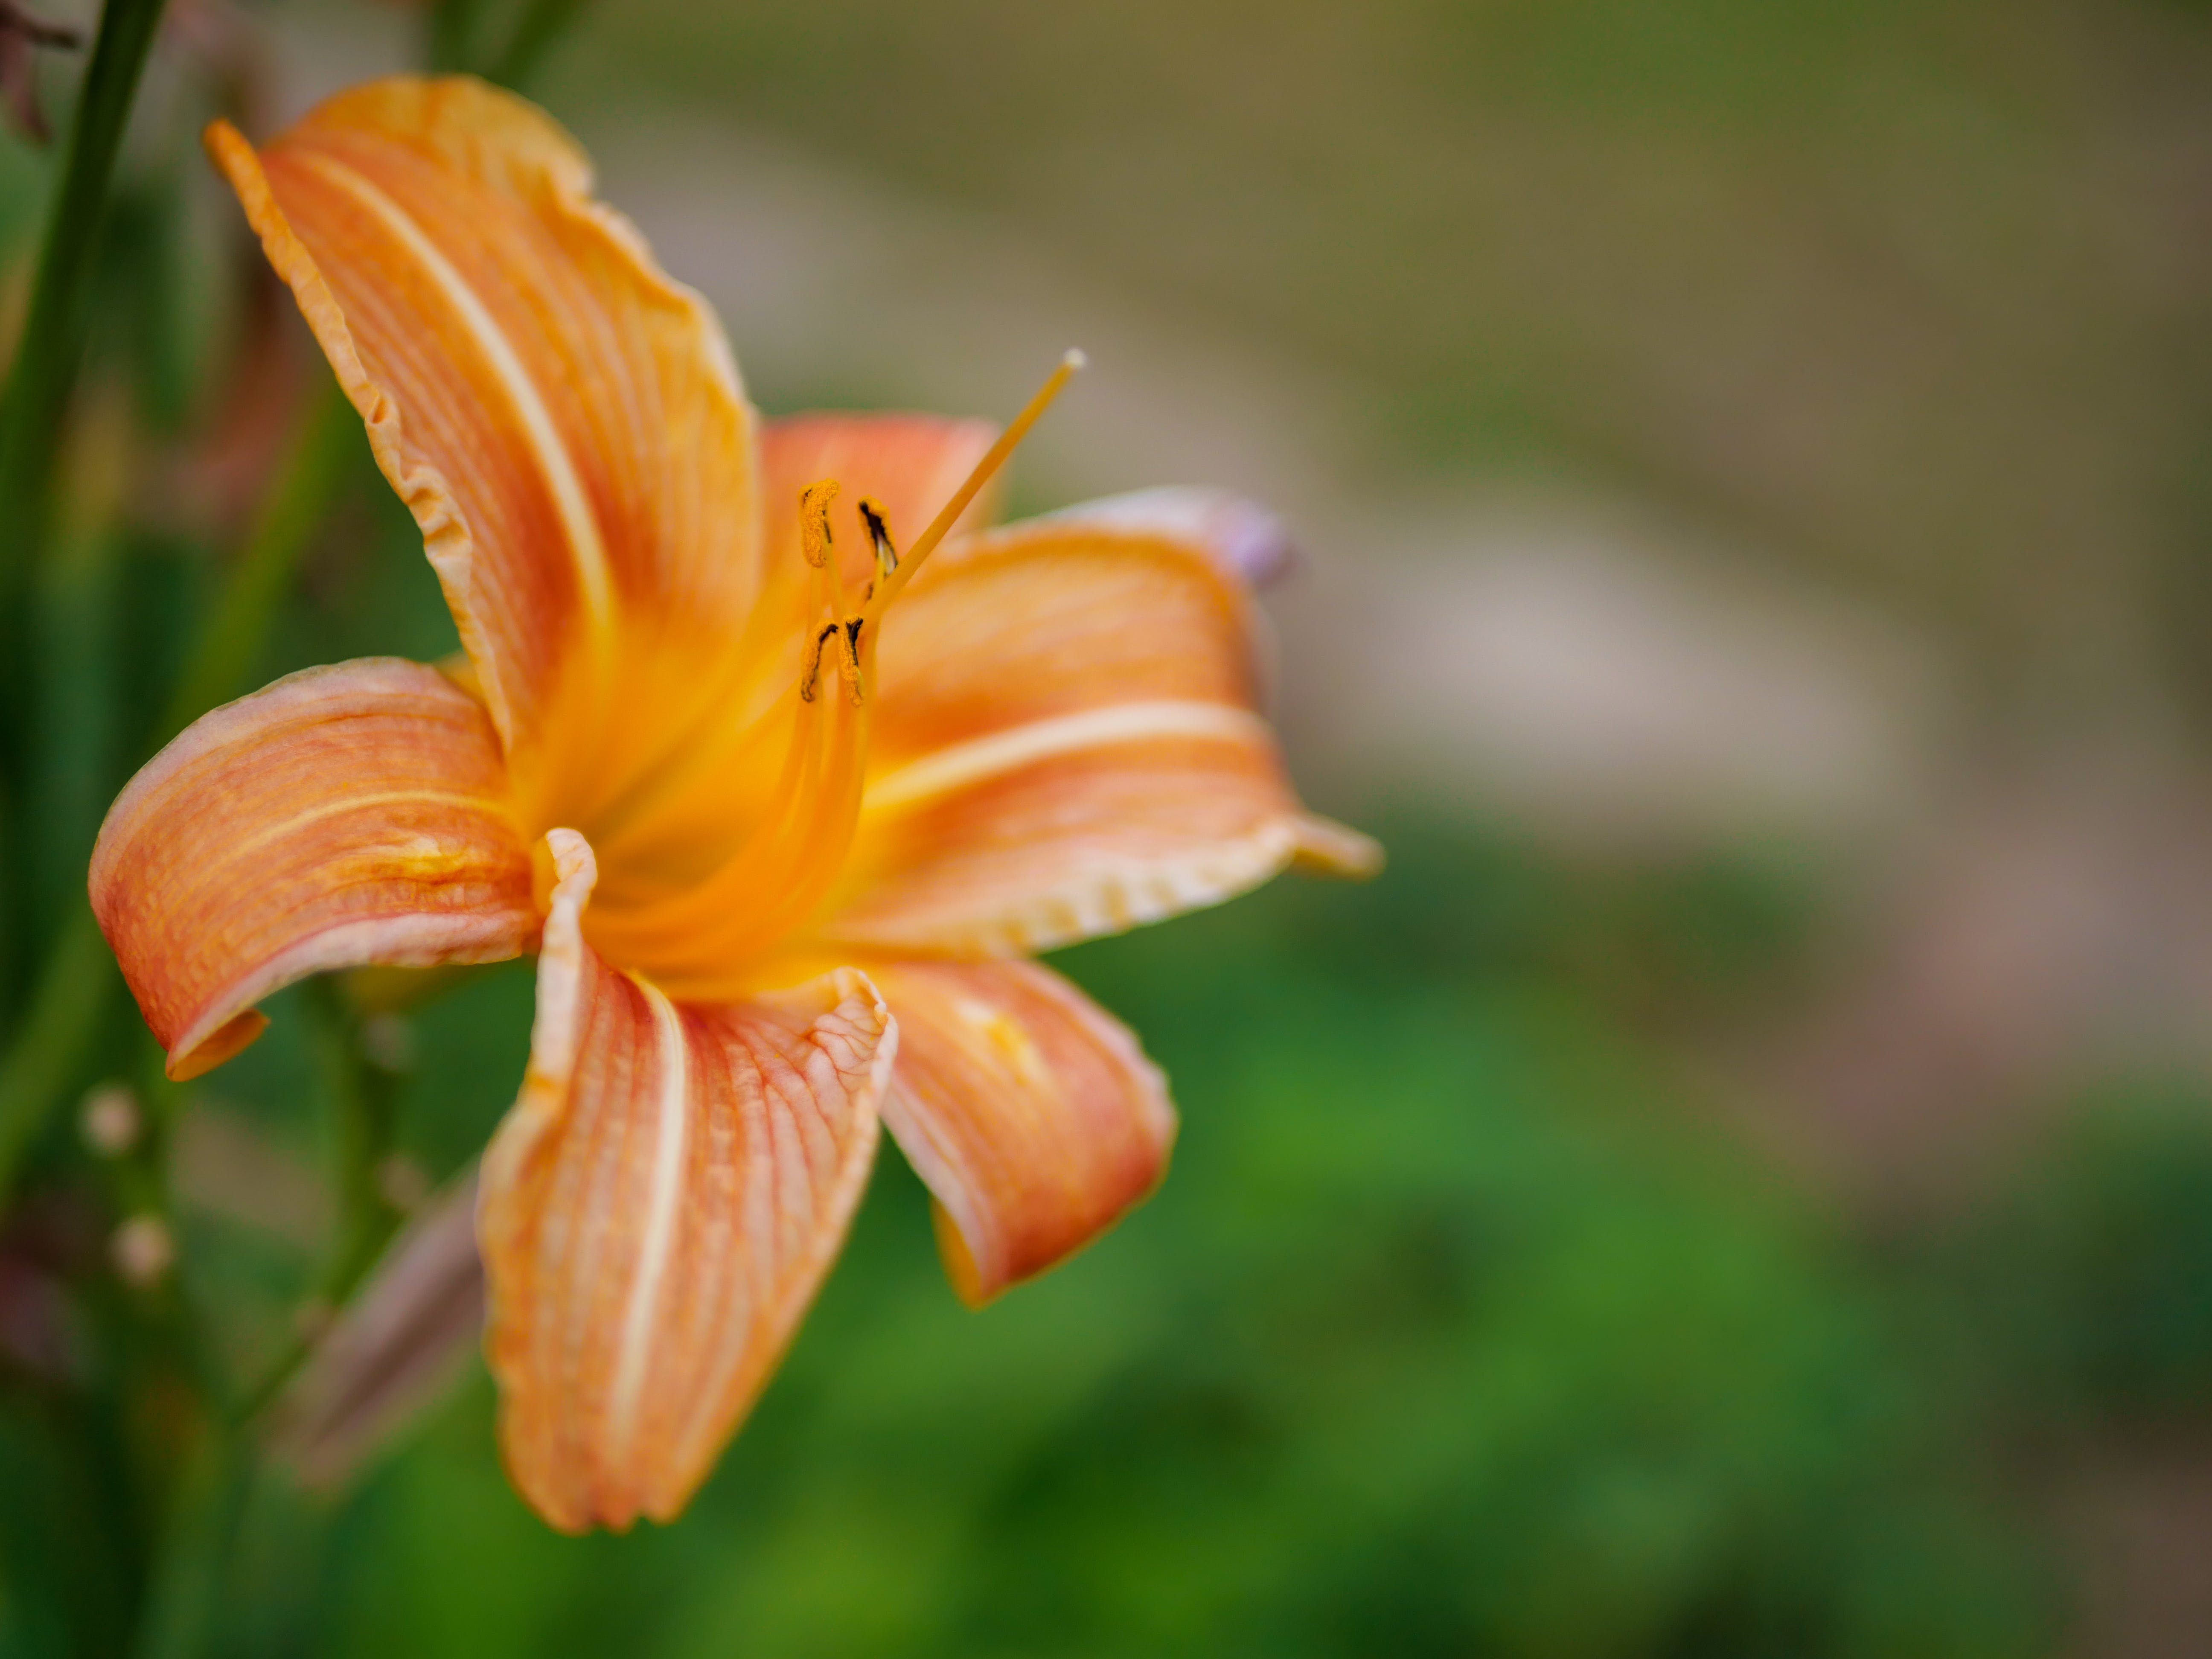 Free stock photo of orange, flower, blossom, detail